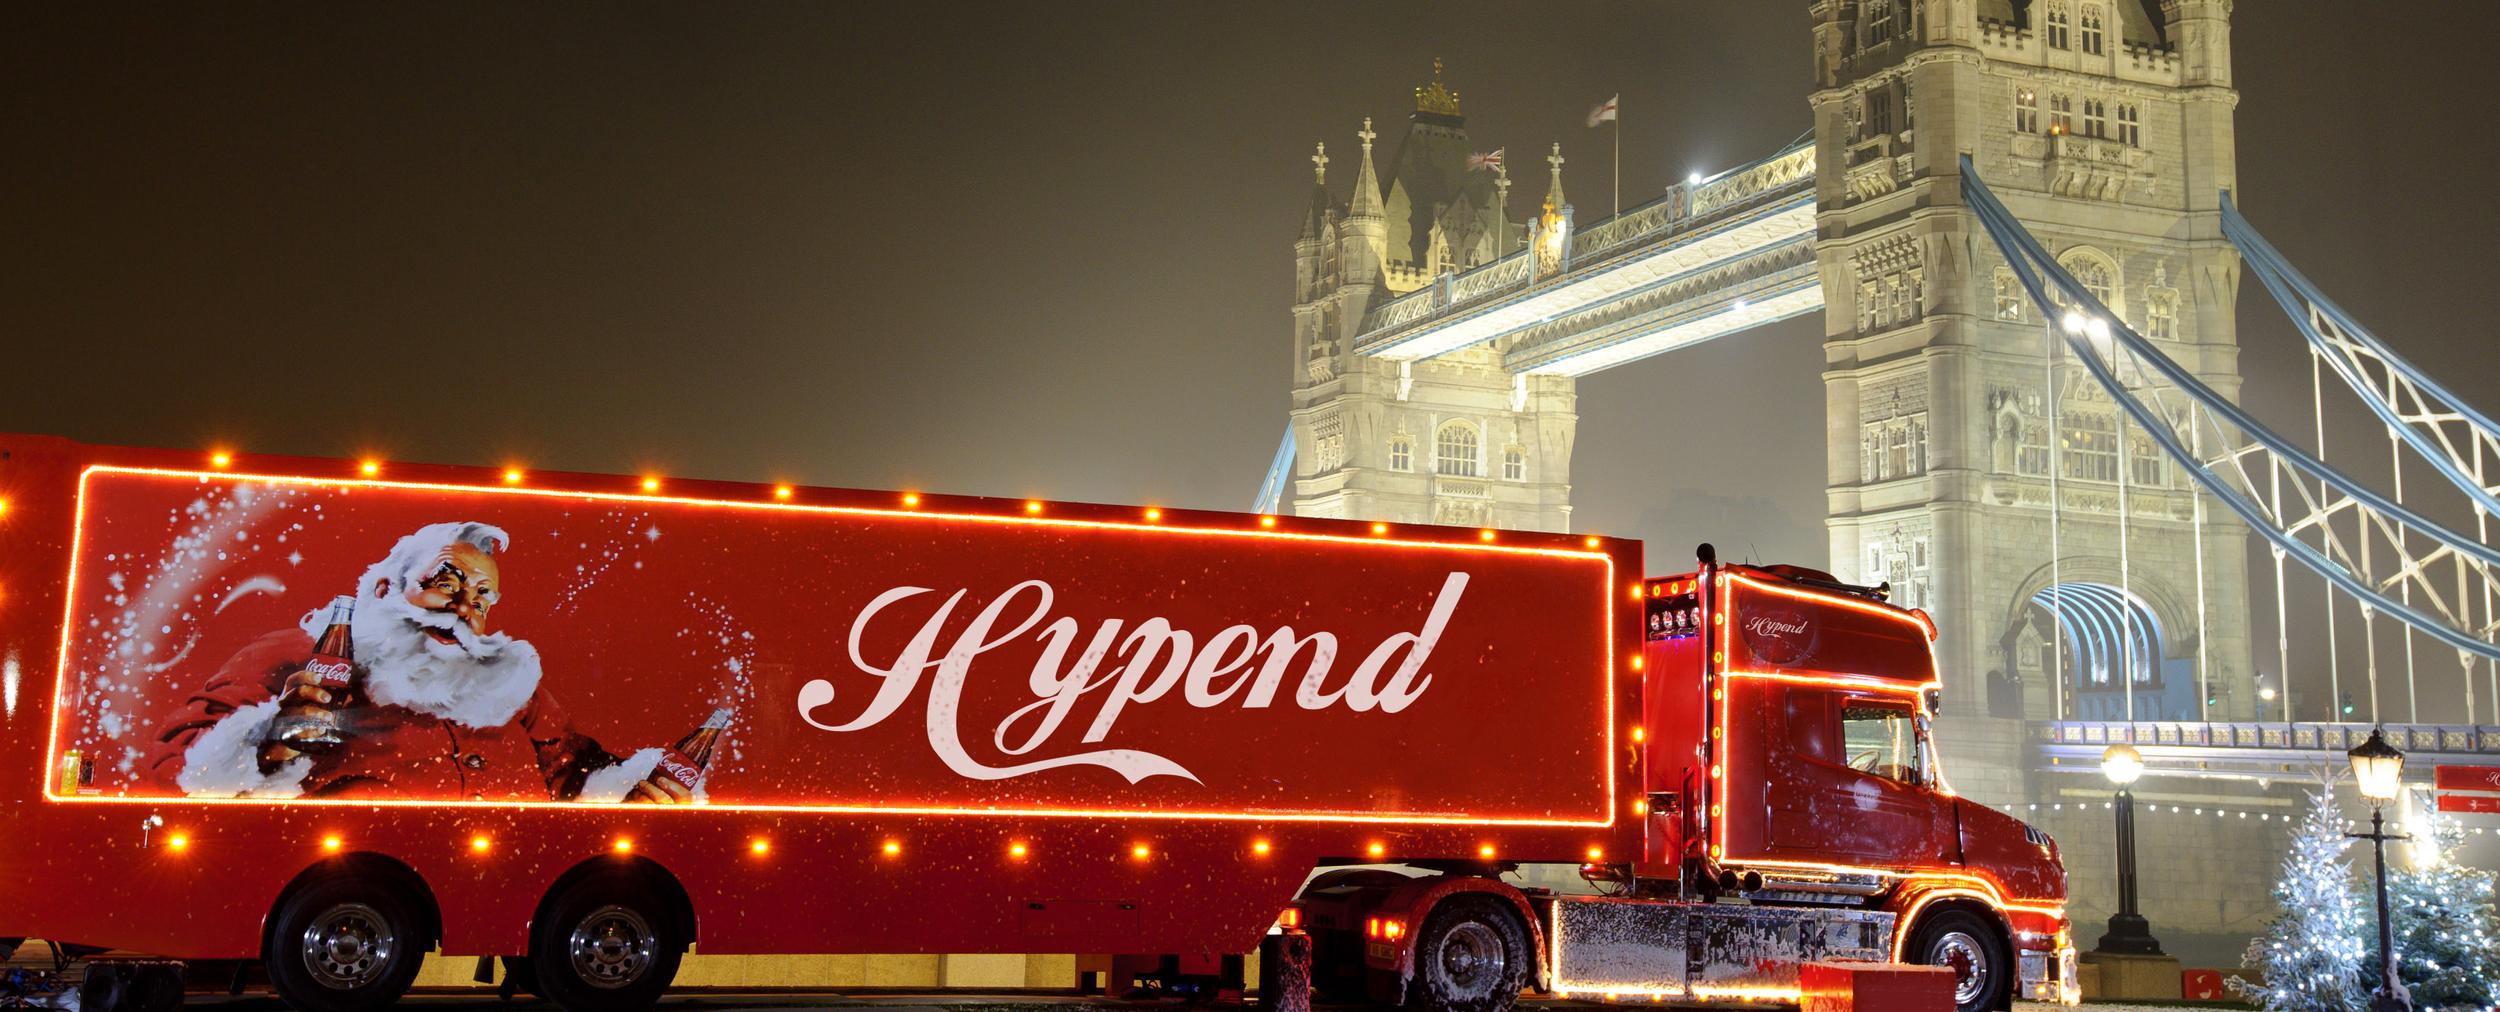 Hypend Homage for Coca Cola Christmas Truck  December 2017  Designed by: Miikka Marjamäki